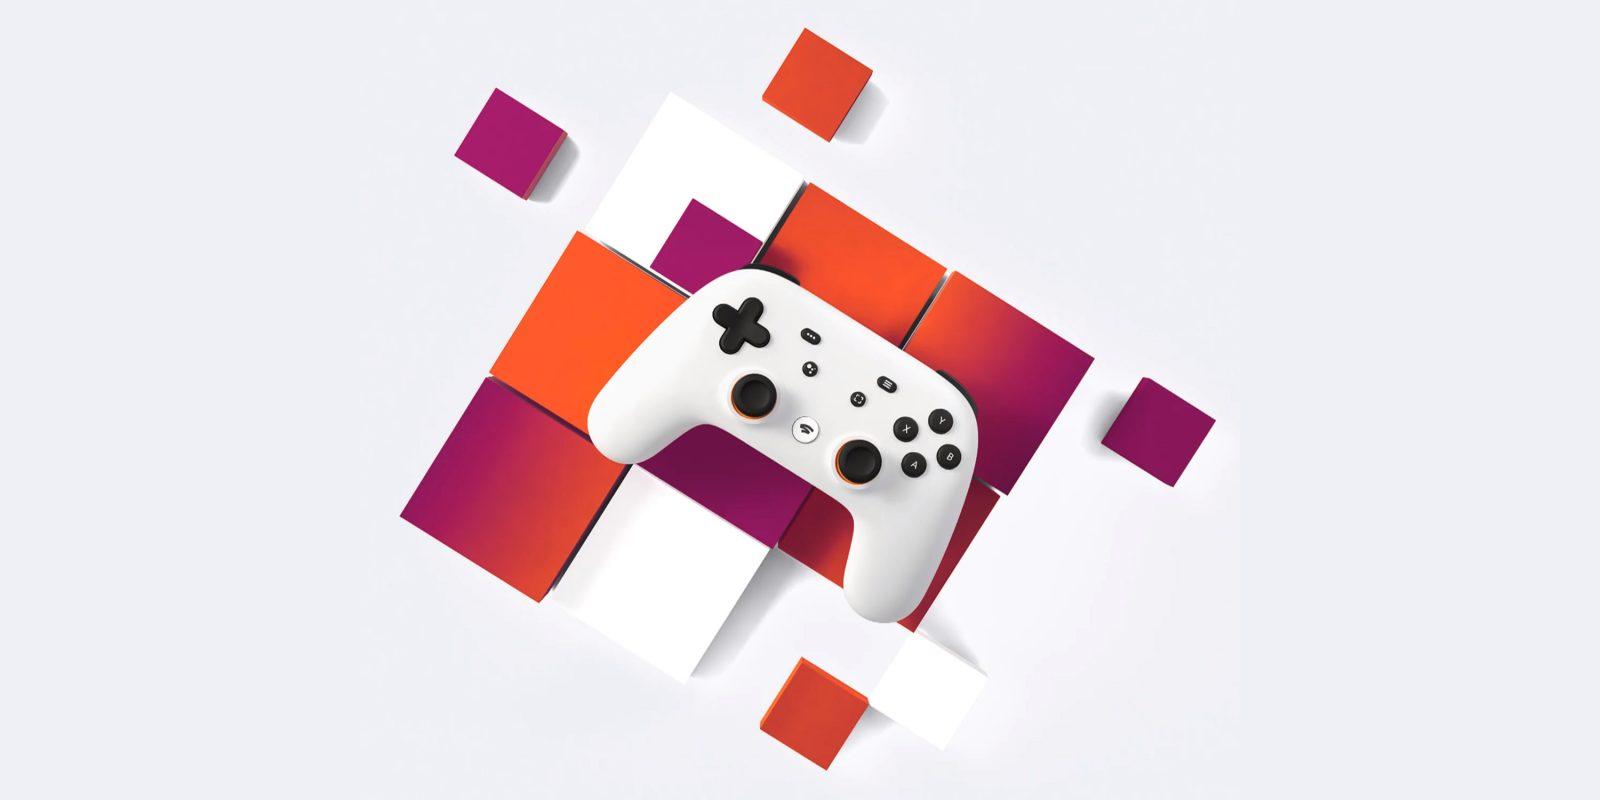 Stadia Connect科隆直播總結:《賽博朋克2077》等大作確認登陸,《獸人必須死3》限時獨佔